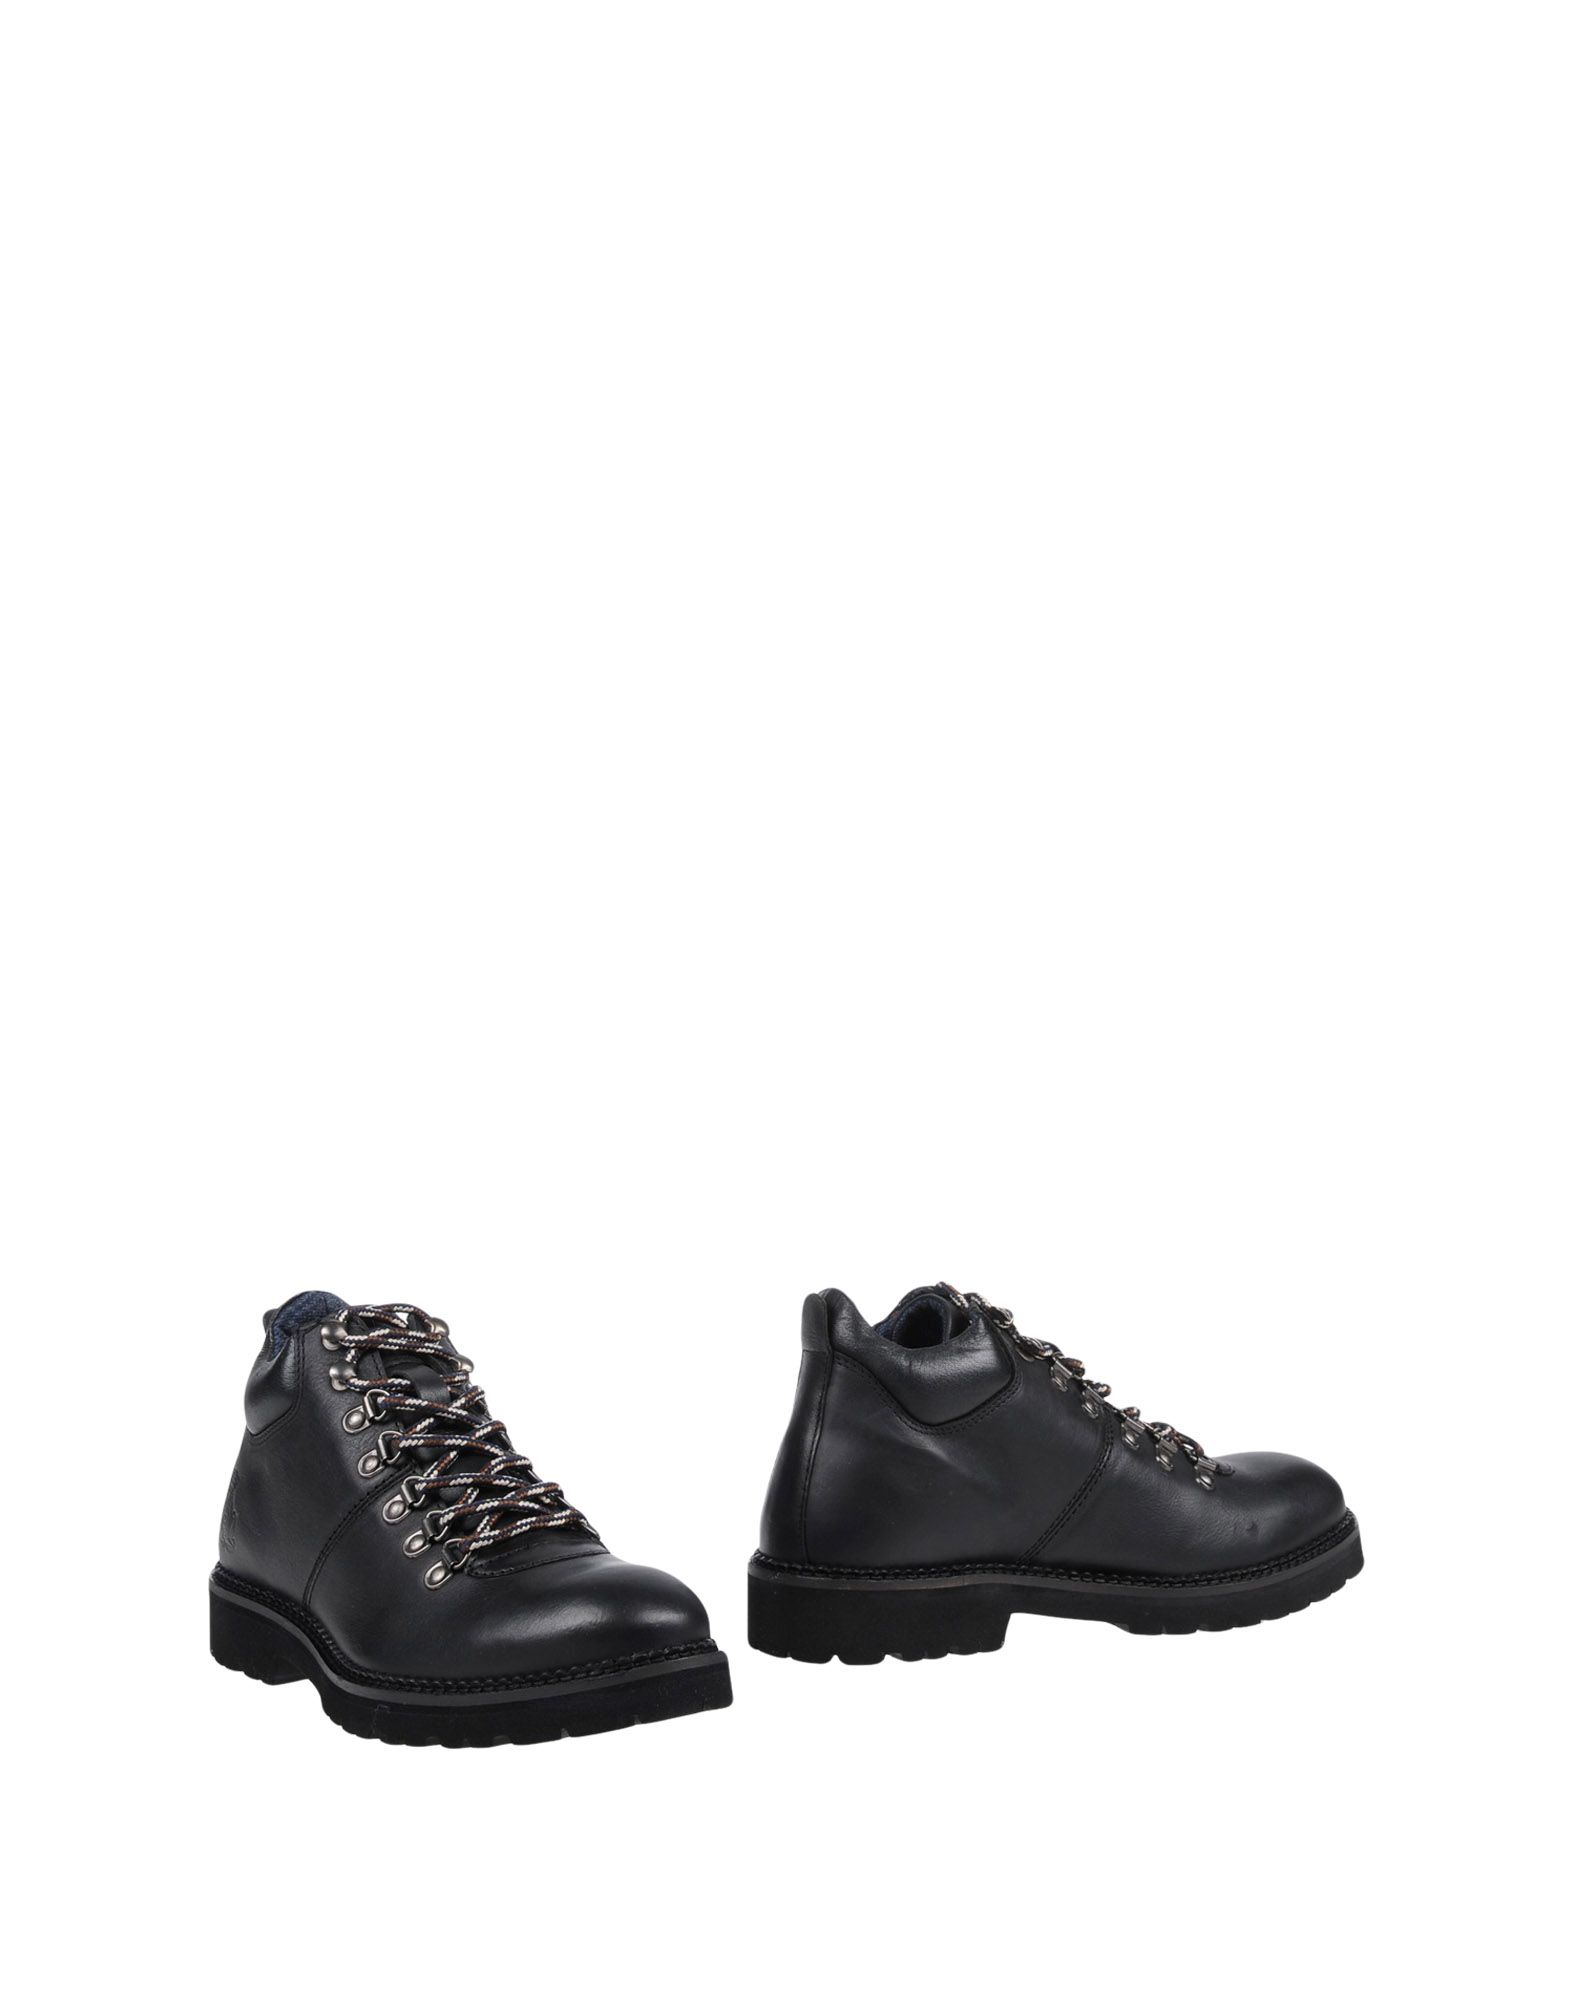 Chaussures À Lacets Armata Di Mare Femme - Chaussures À Lacets Armata Di Mare sur